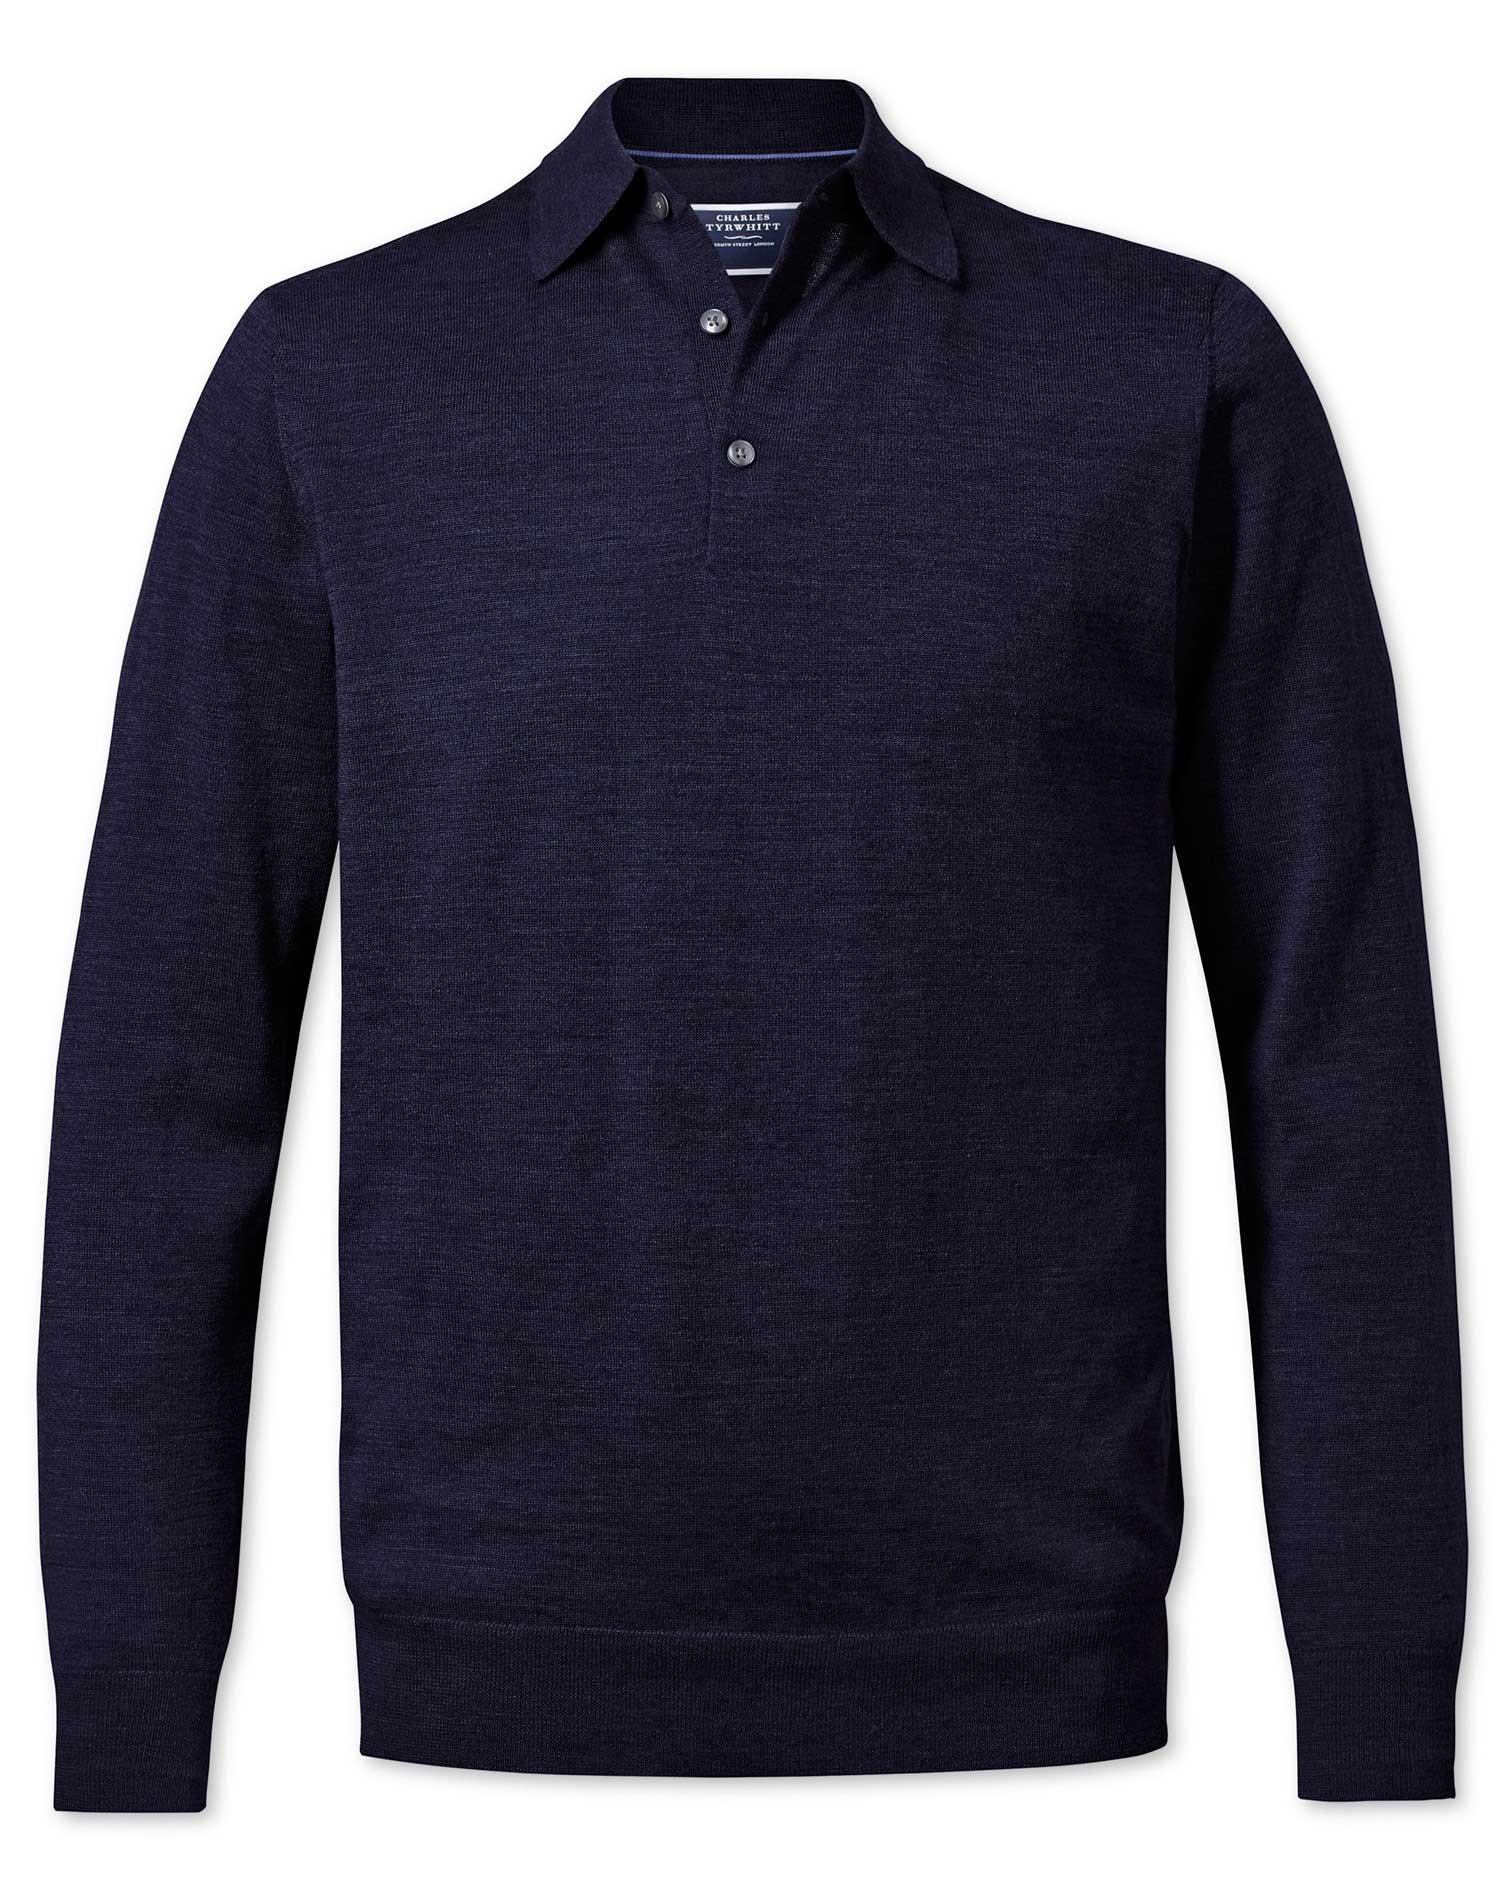 Navy Merino Wool Zip Through Cardigan Size Large by Charles Tyrwhitt